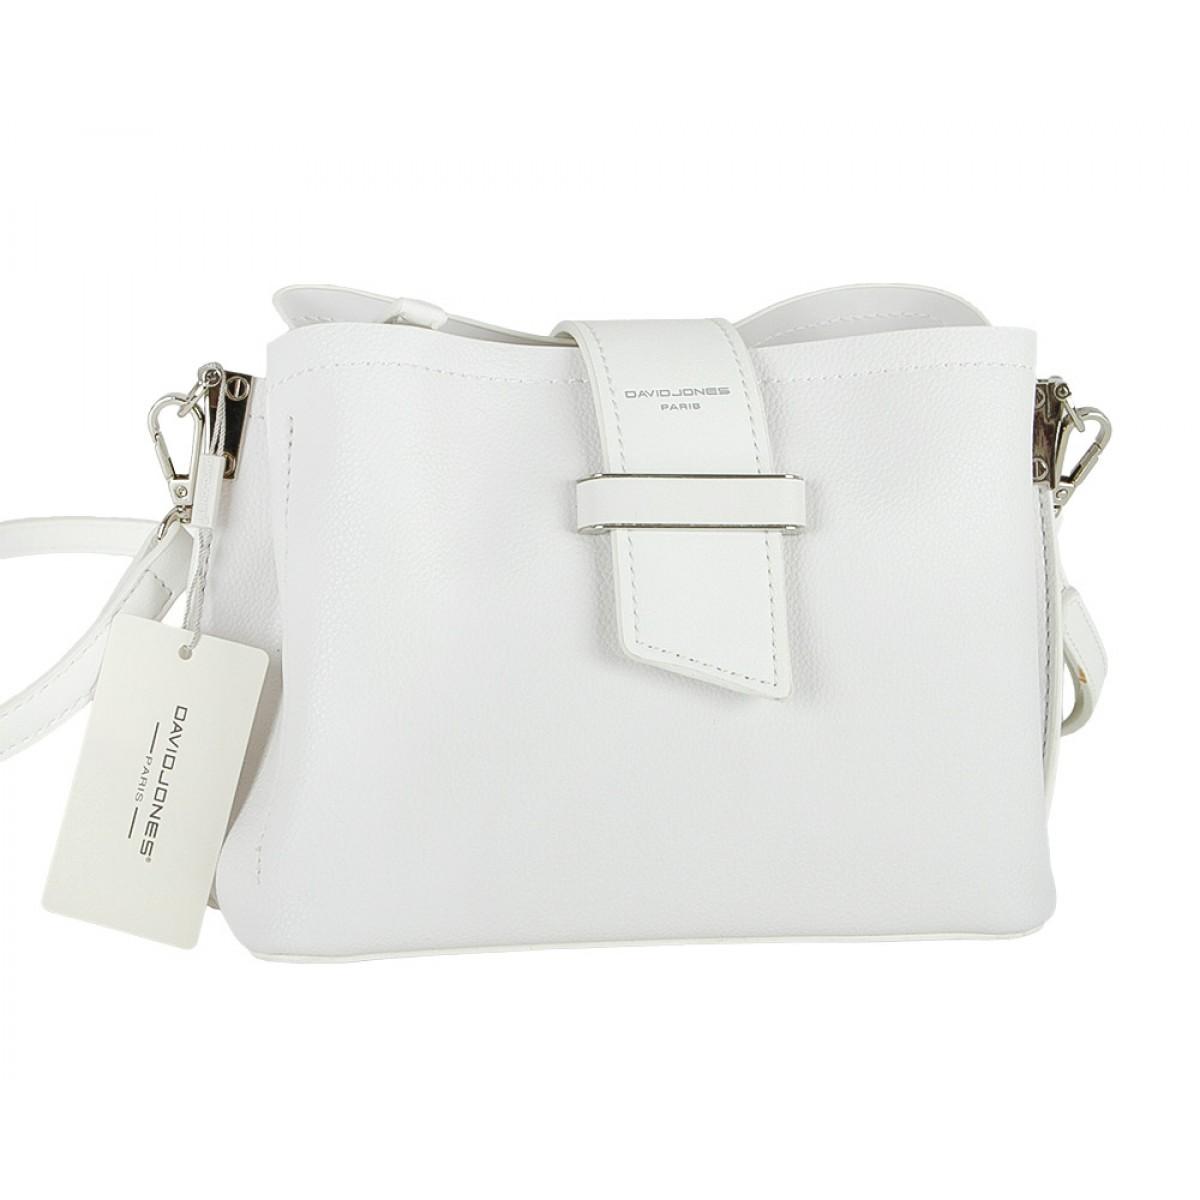 Жіноча сумка David Jones 5943-1 WHITE